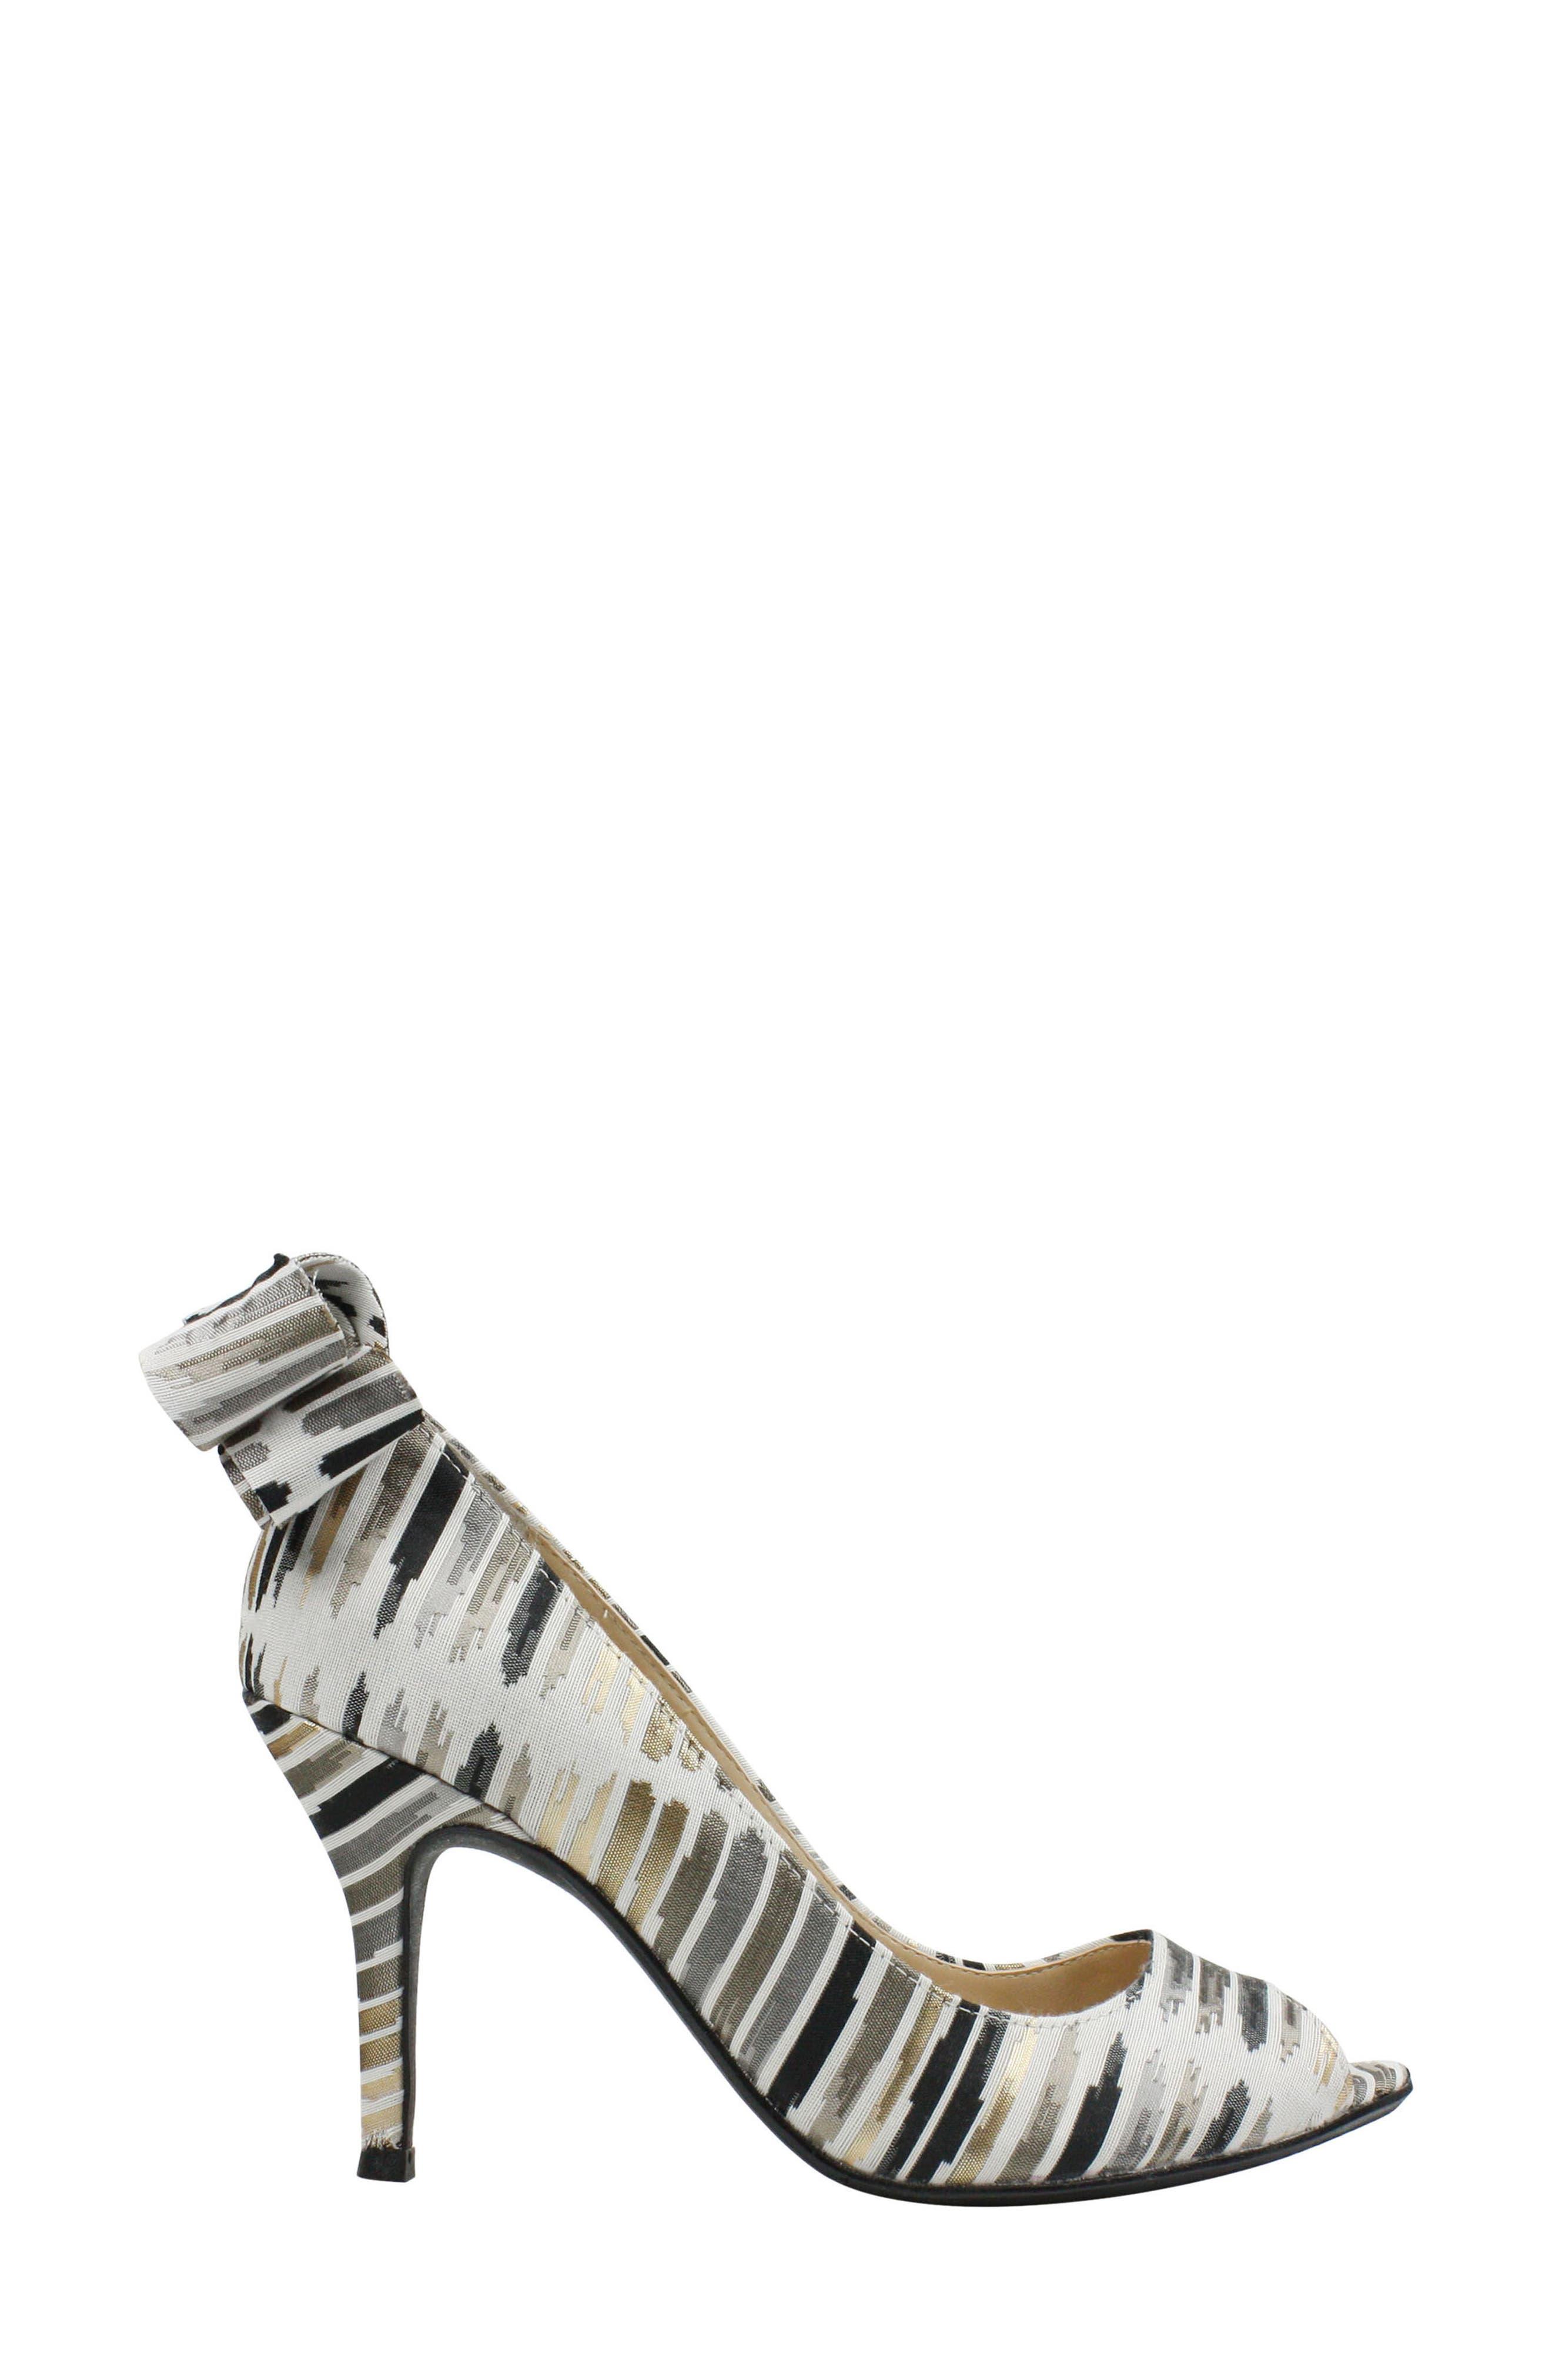 Ellasee Bow Peep Toe Pump,                             Alternate thumbnail 3, color,                             Cream/ Black/ Gold Fabric